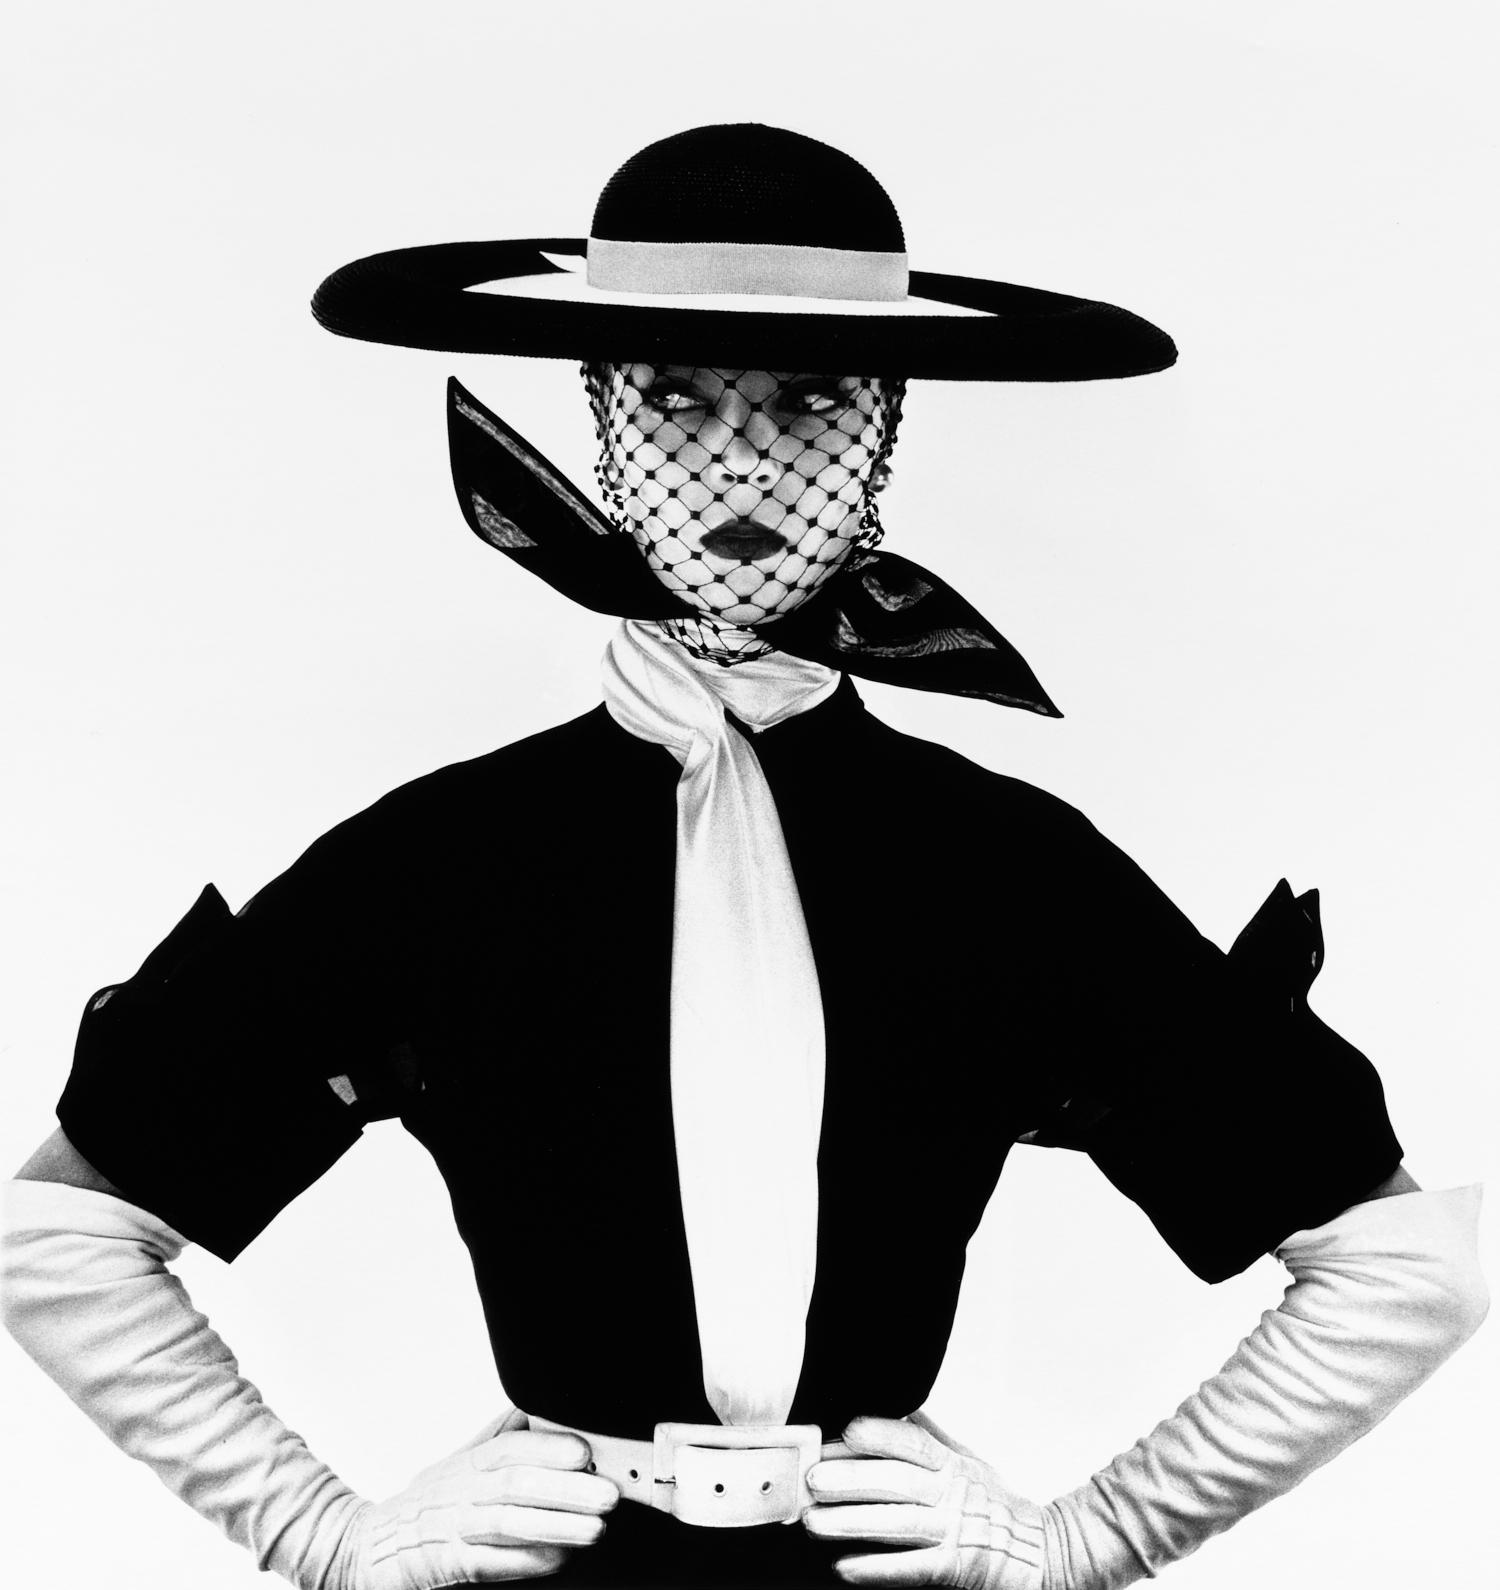 Black and White  Vogue  Cover (Jean Patchett) , New York, 1950 Gelatin silver print © Condé Nast